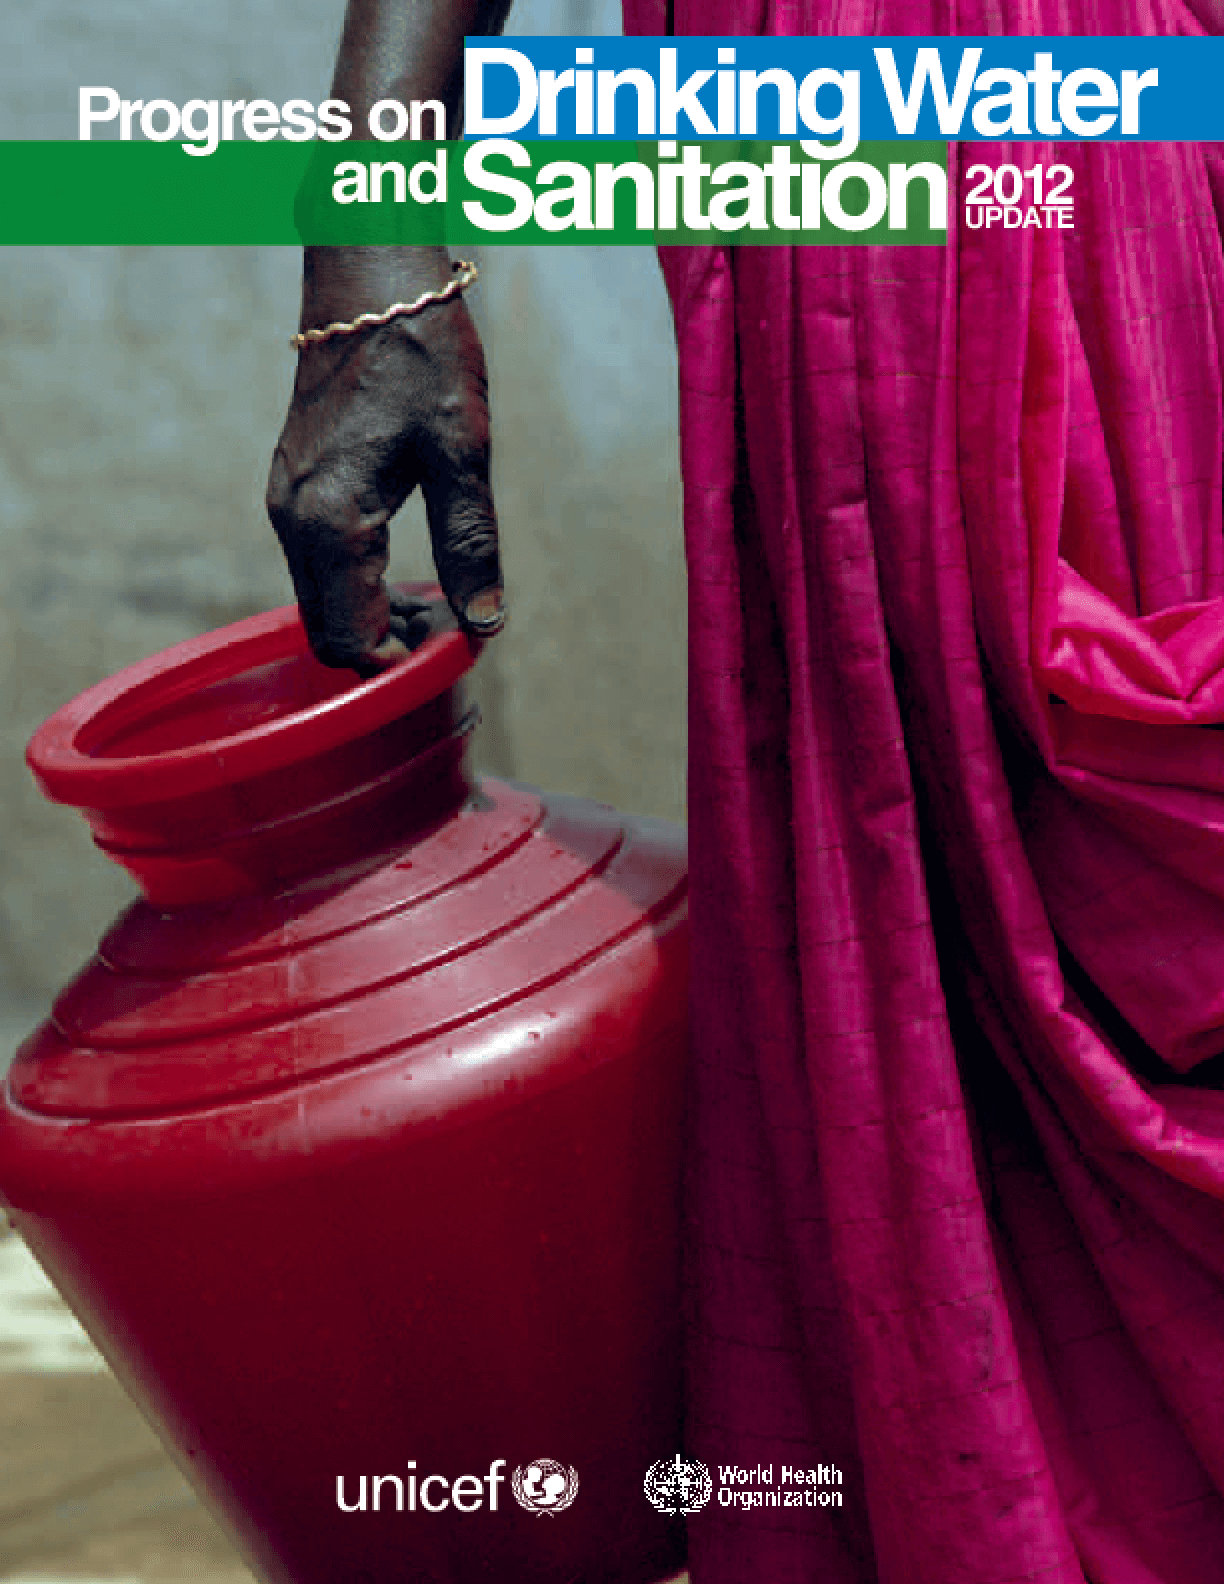 Progress on Drinking Water and Sanitation: 2012 Update